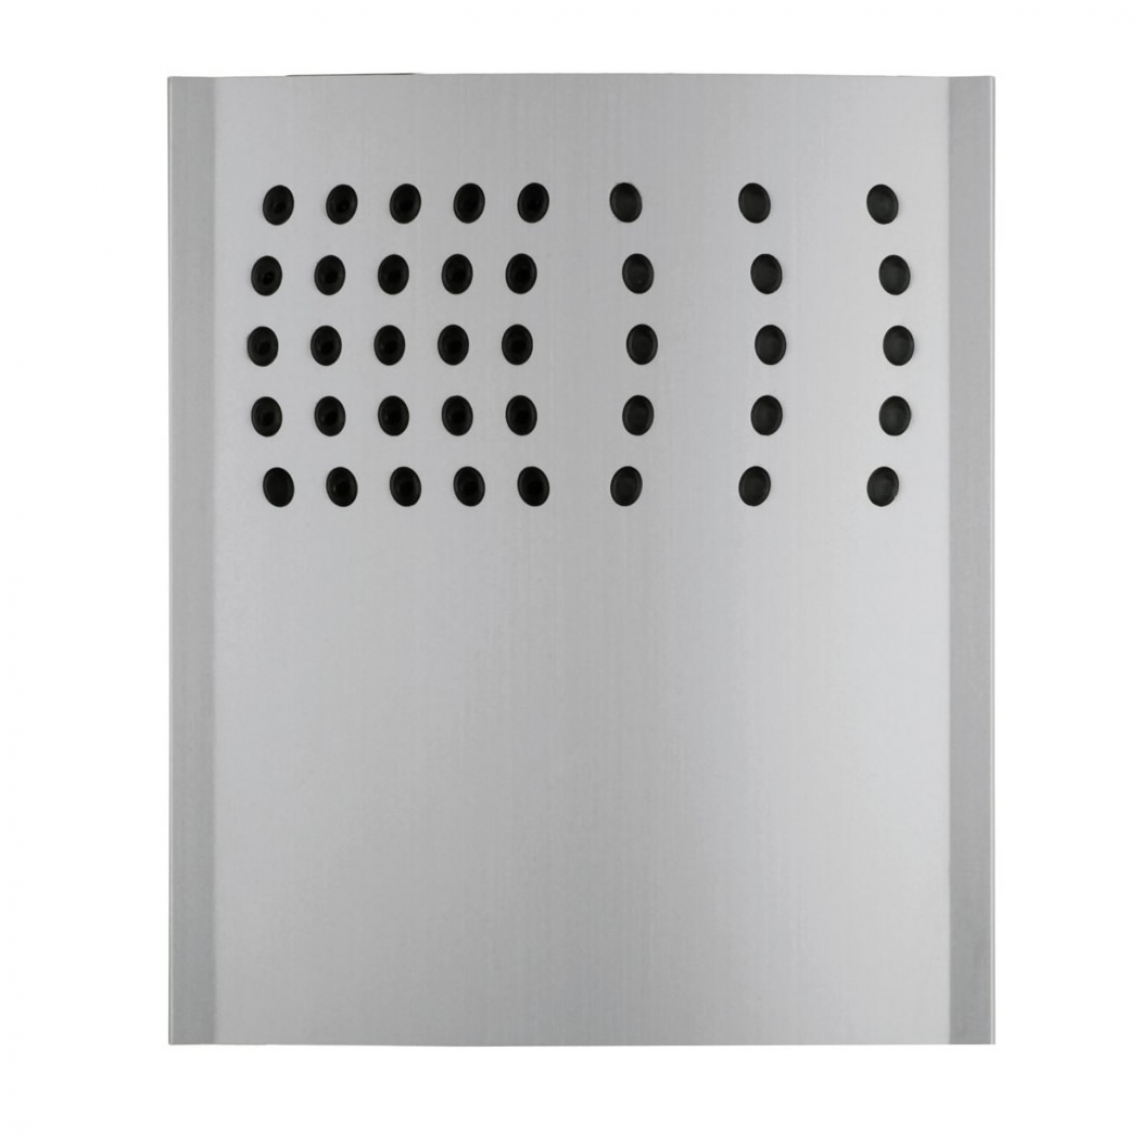 Posto esterno GSM 0 pulsanti - PL10G